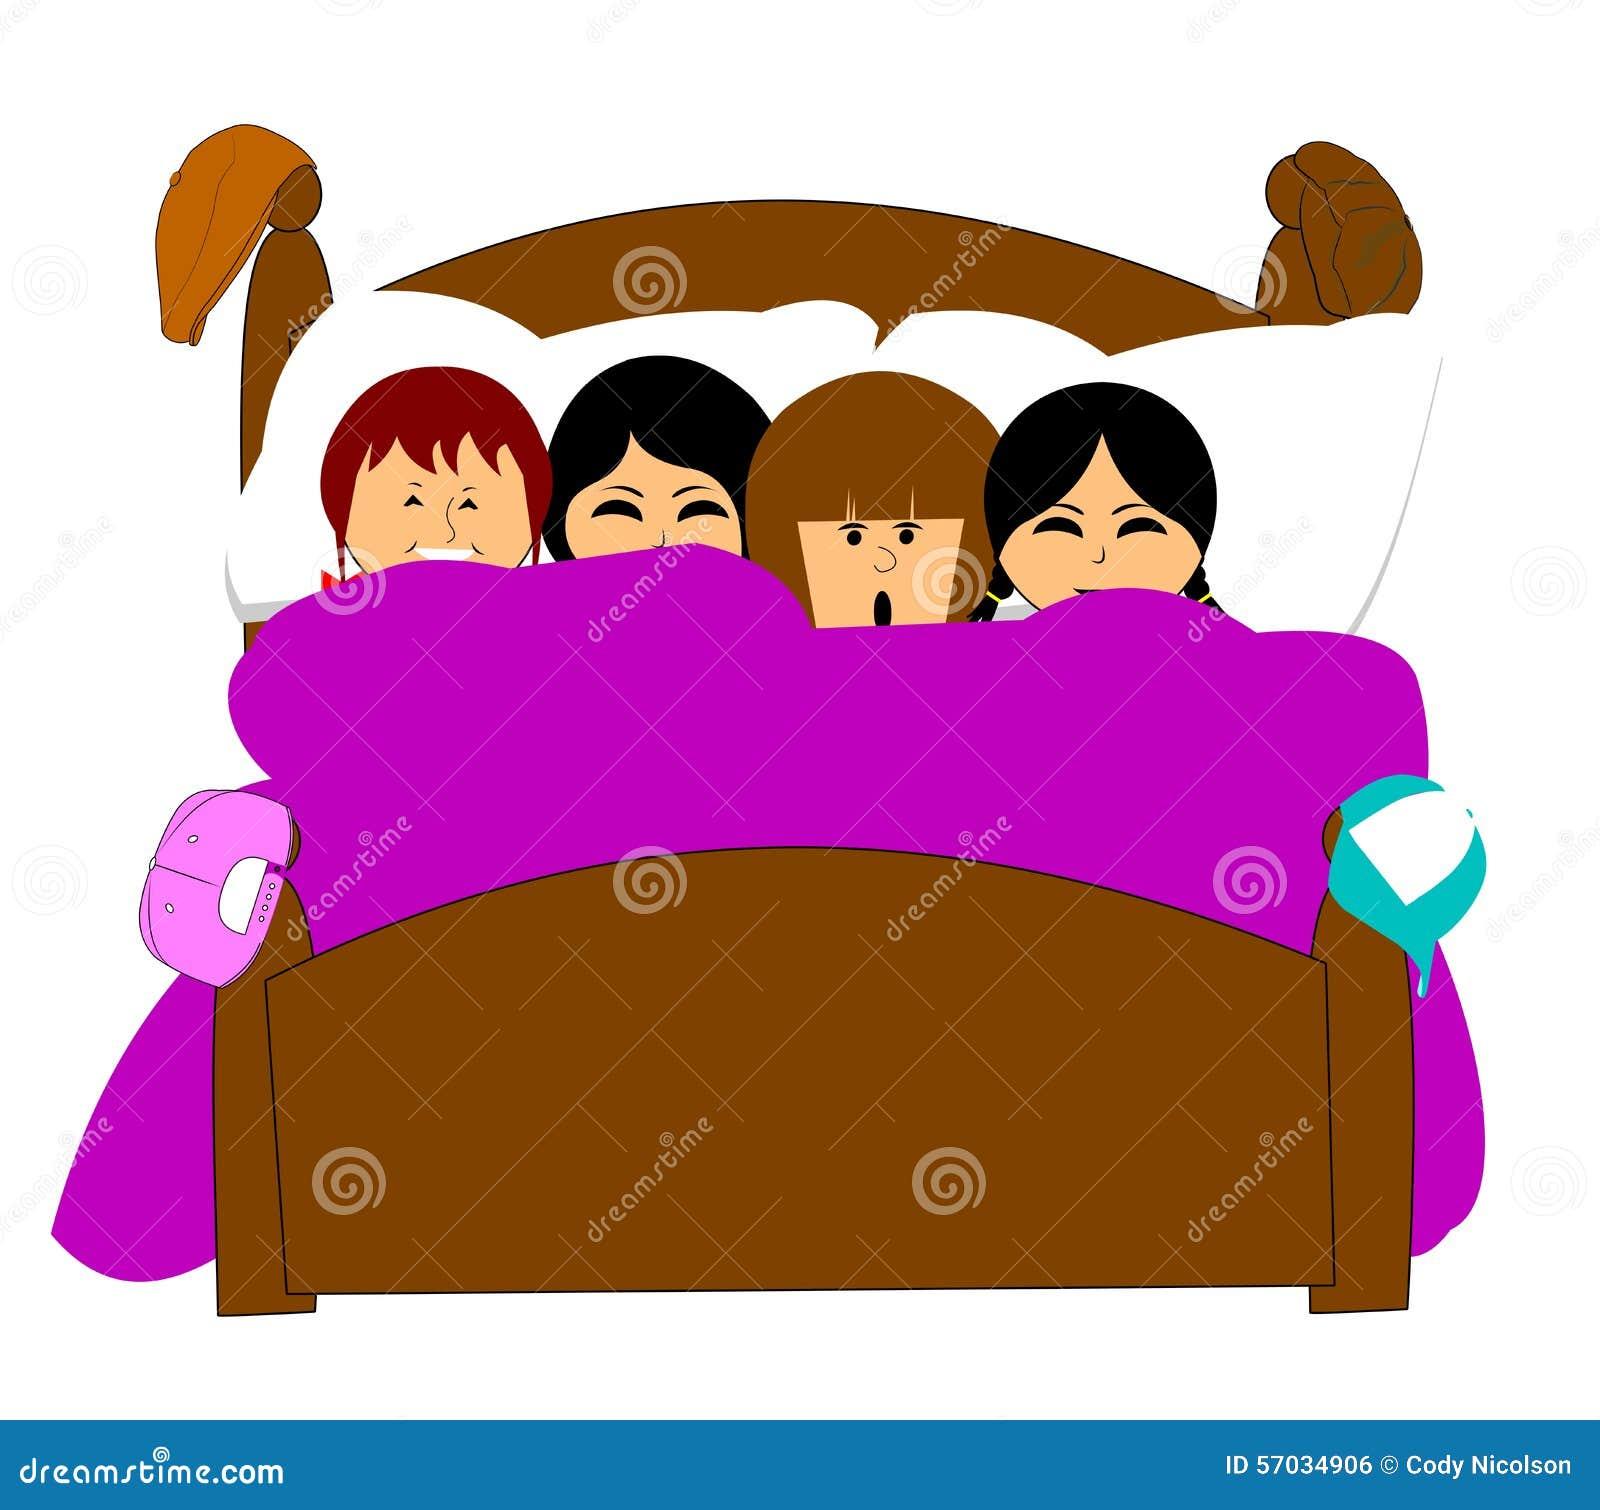 sleepover stock illustration illustration of hair ball 57034906 rh dreamstime com slumber party clipart free slumber party clip art printable